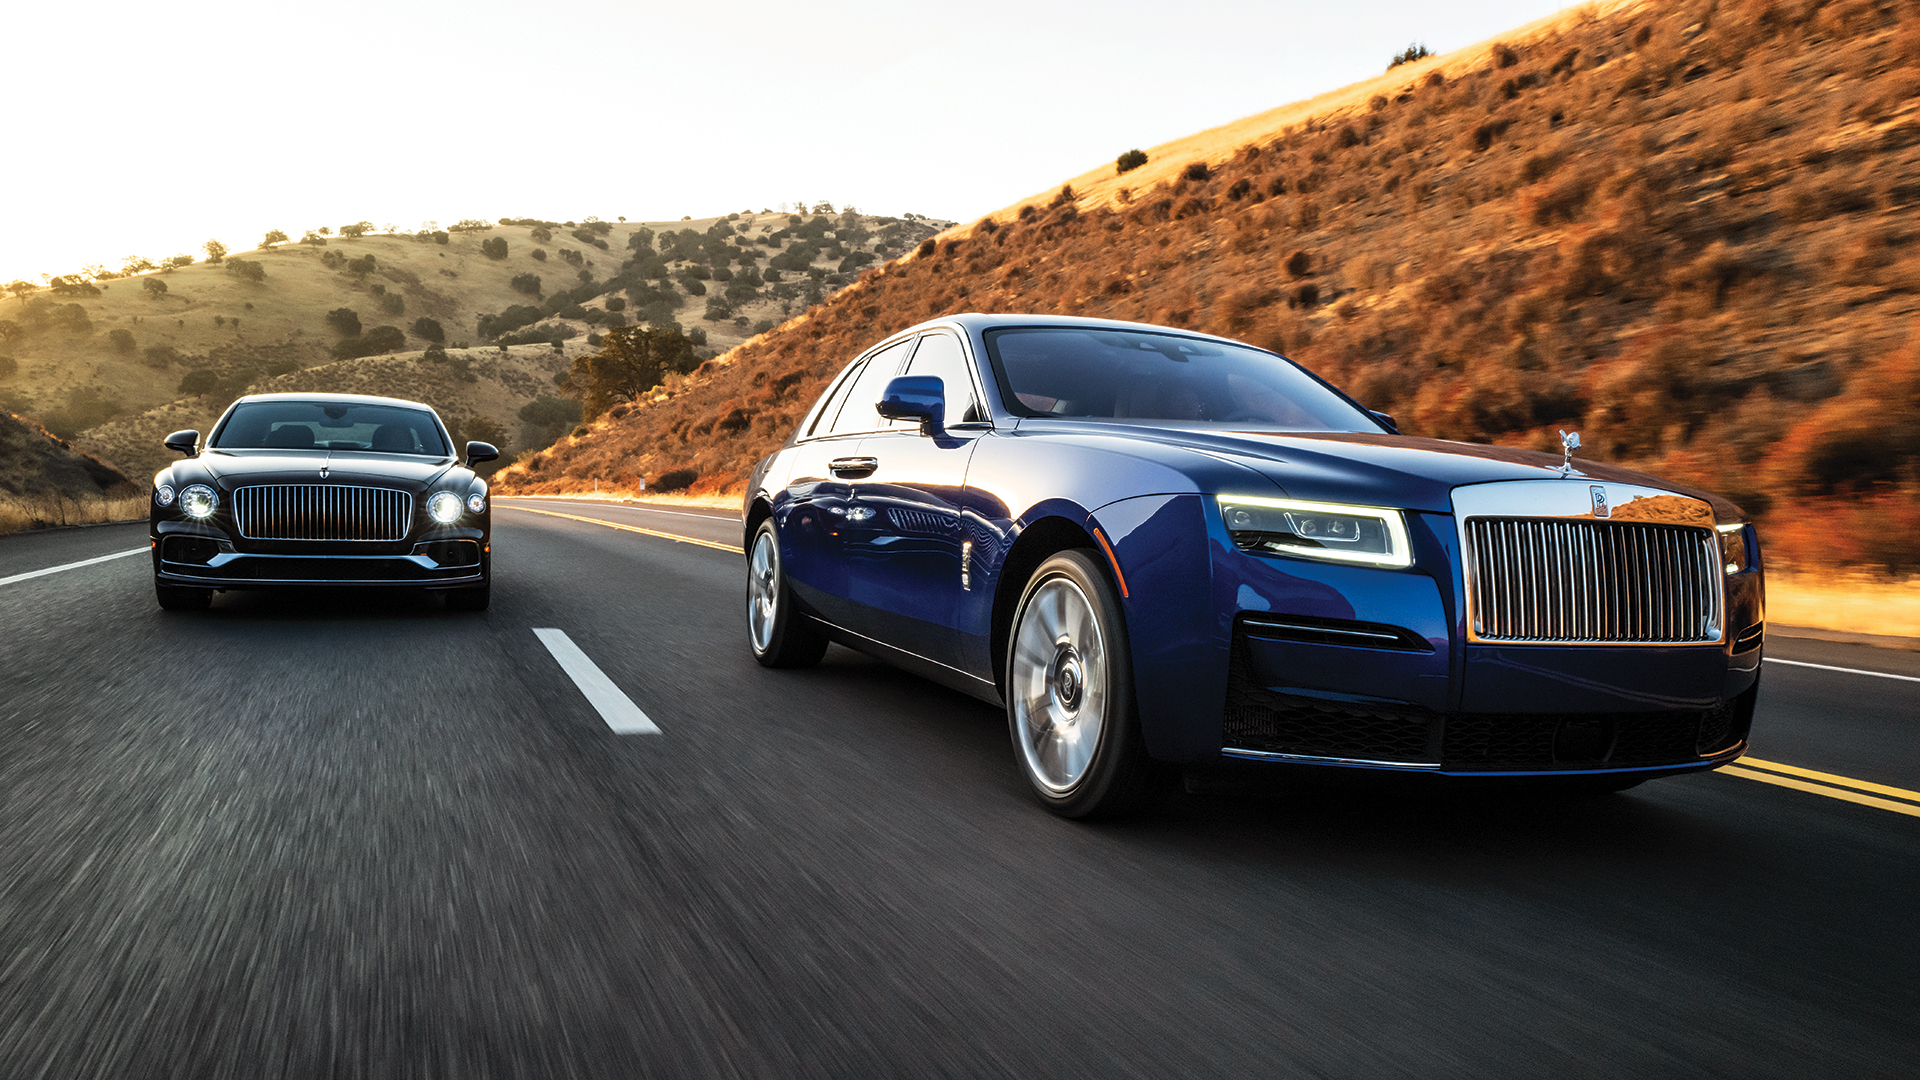 Cars Of The Year 2021 Rolls Royce Ghost And Lamborghini Huracan Evo Robb Report